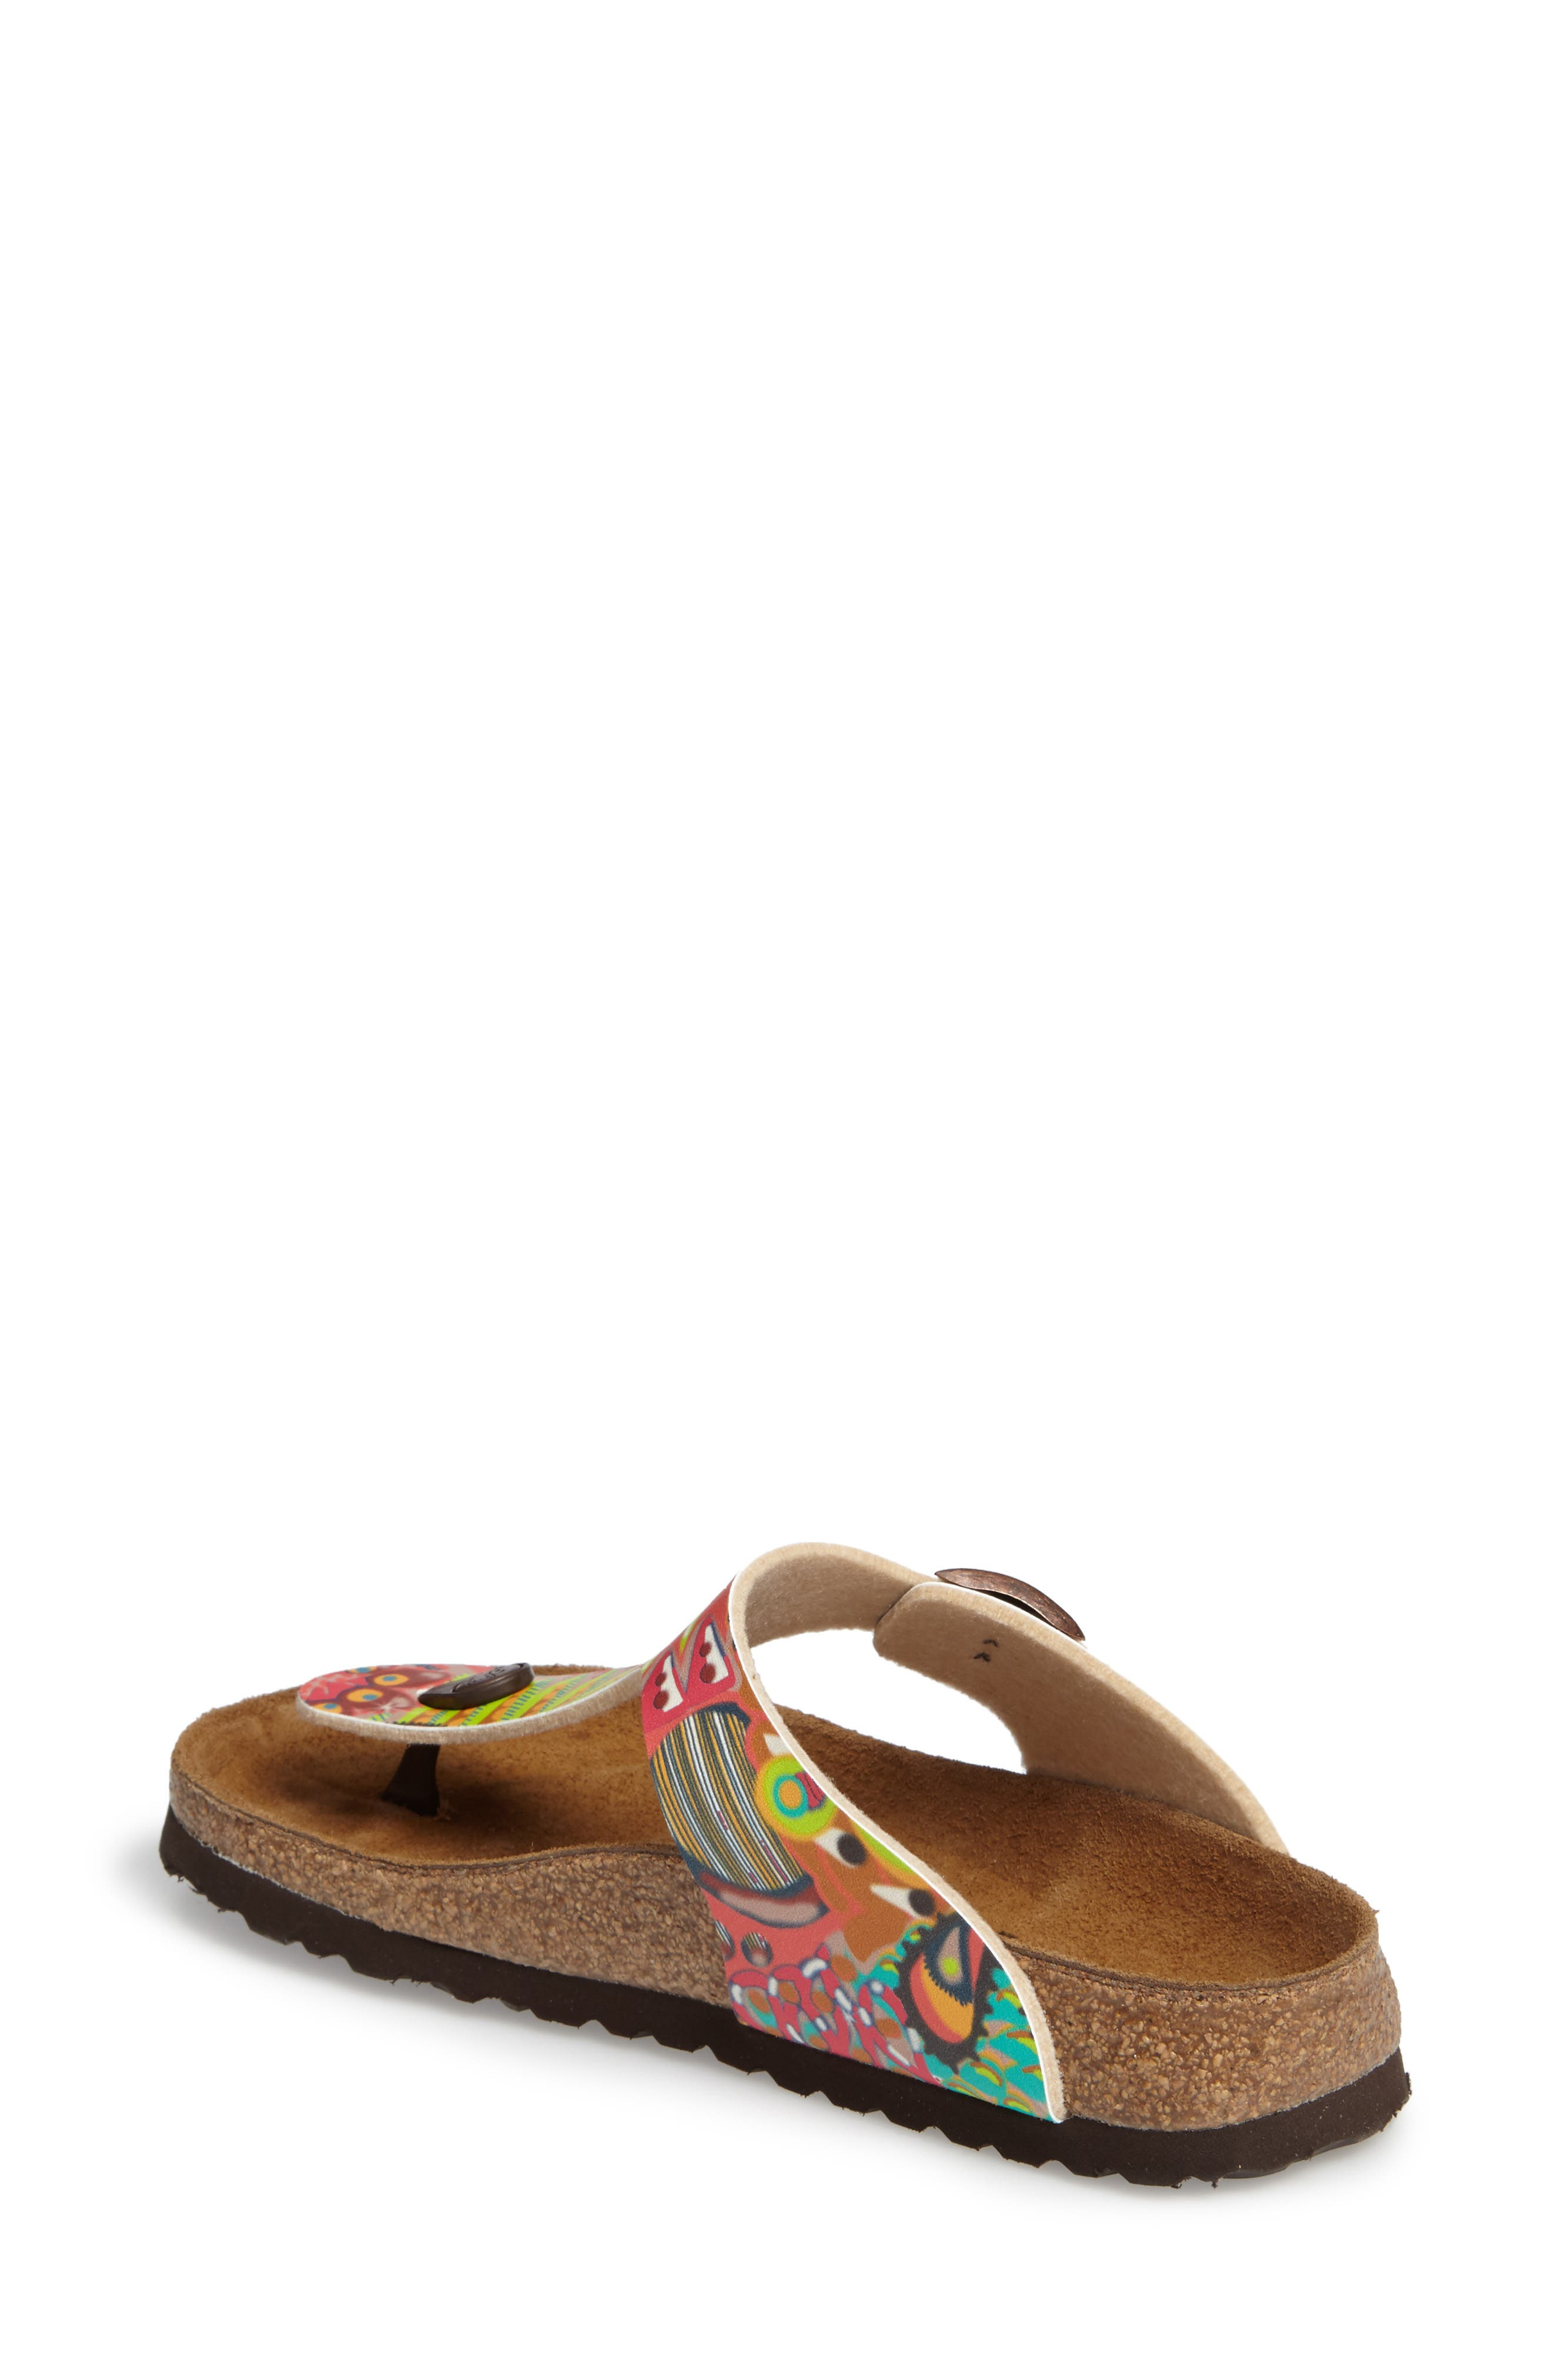 'Gizeh' Sandal,                             Alternate thumbnail 2, color,                             Raspberry Multi